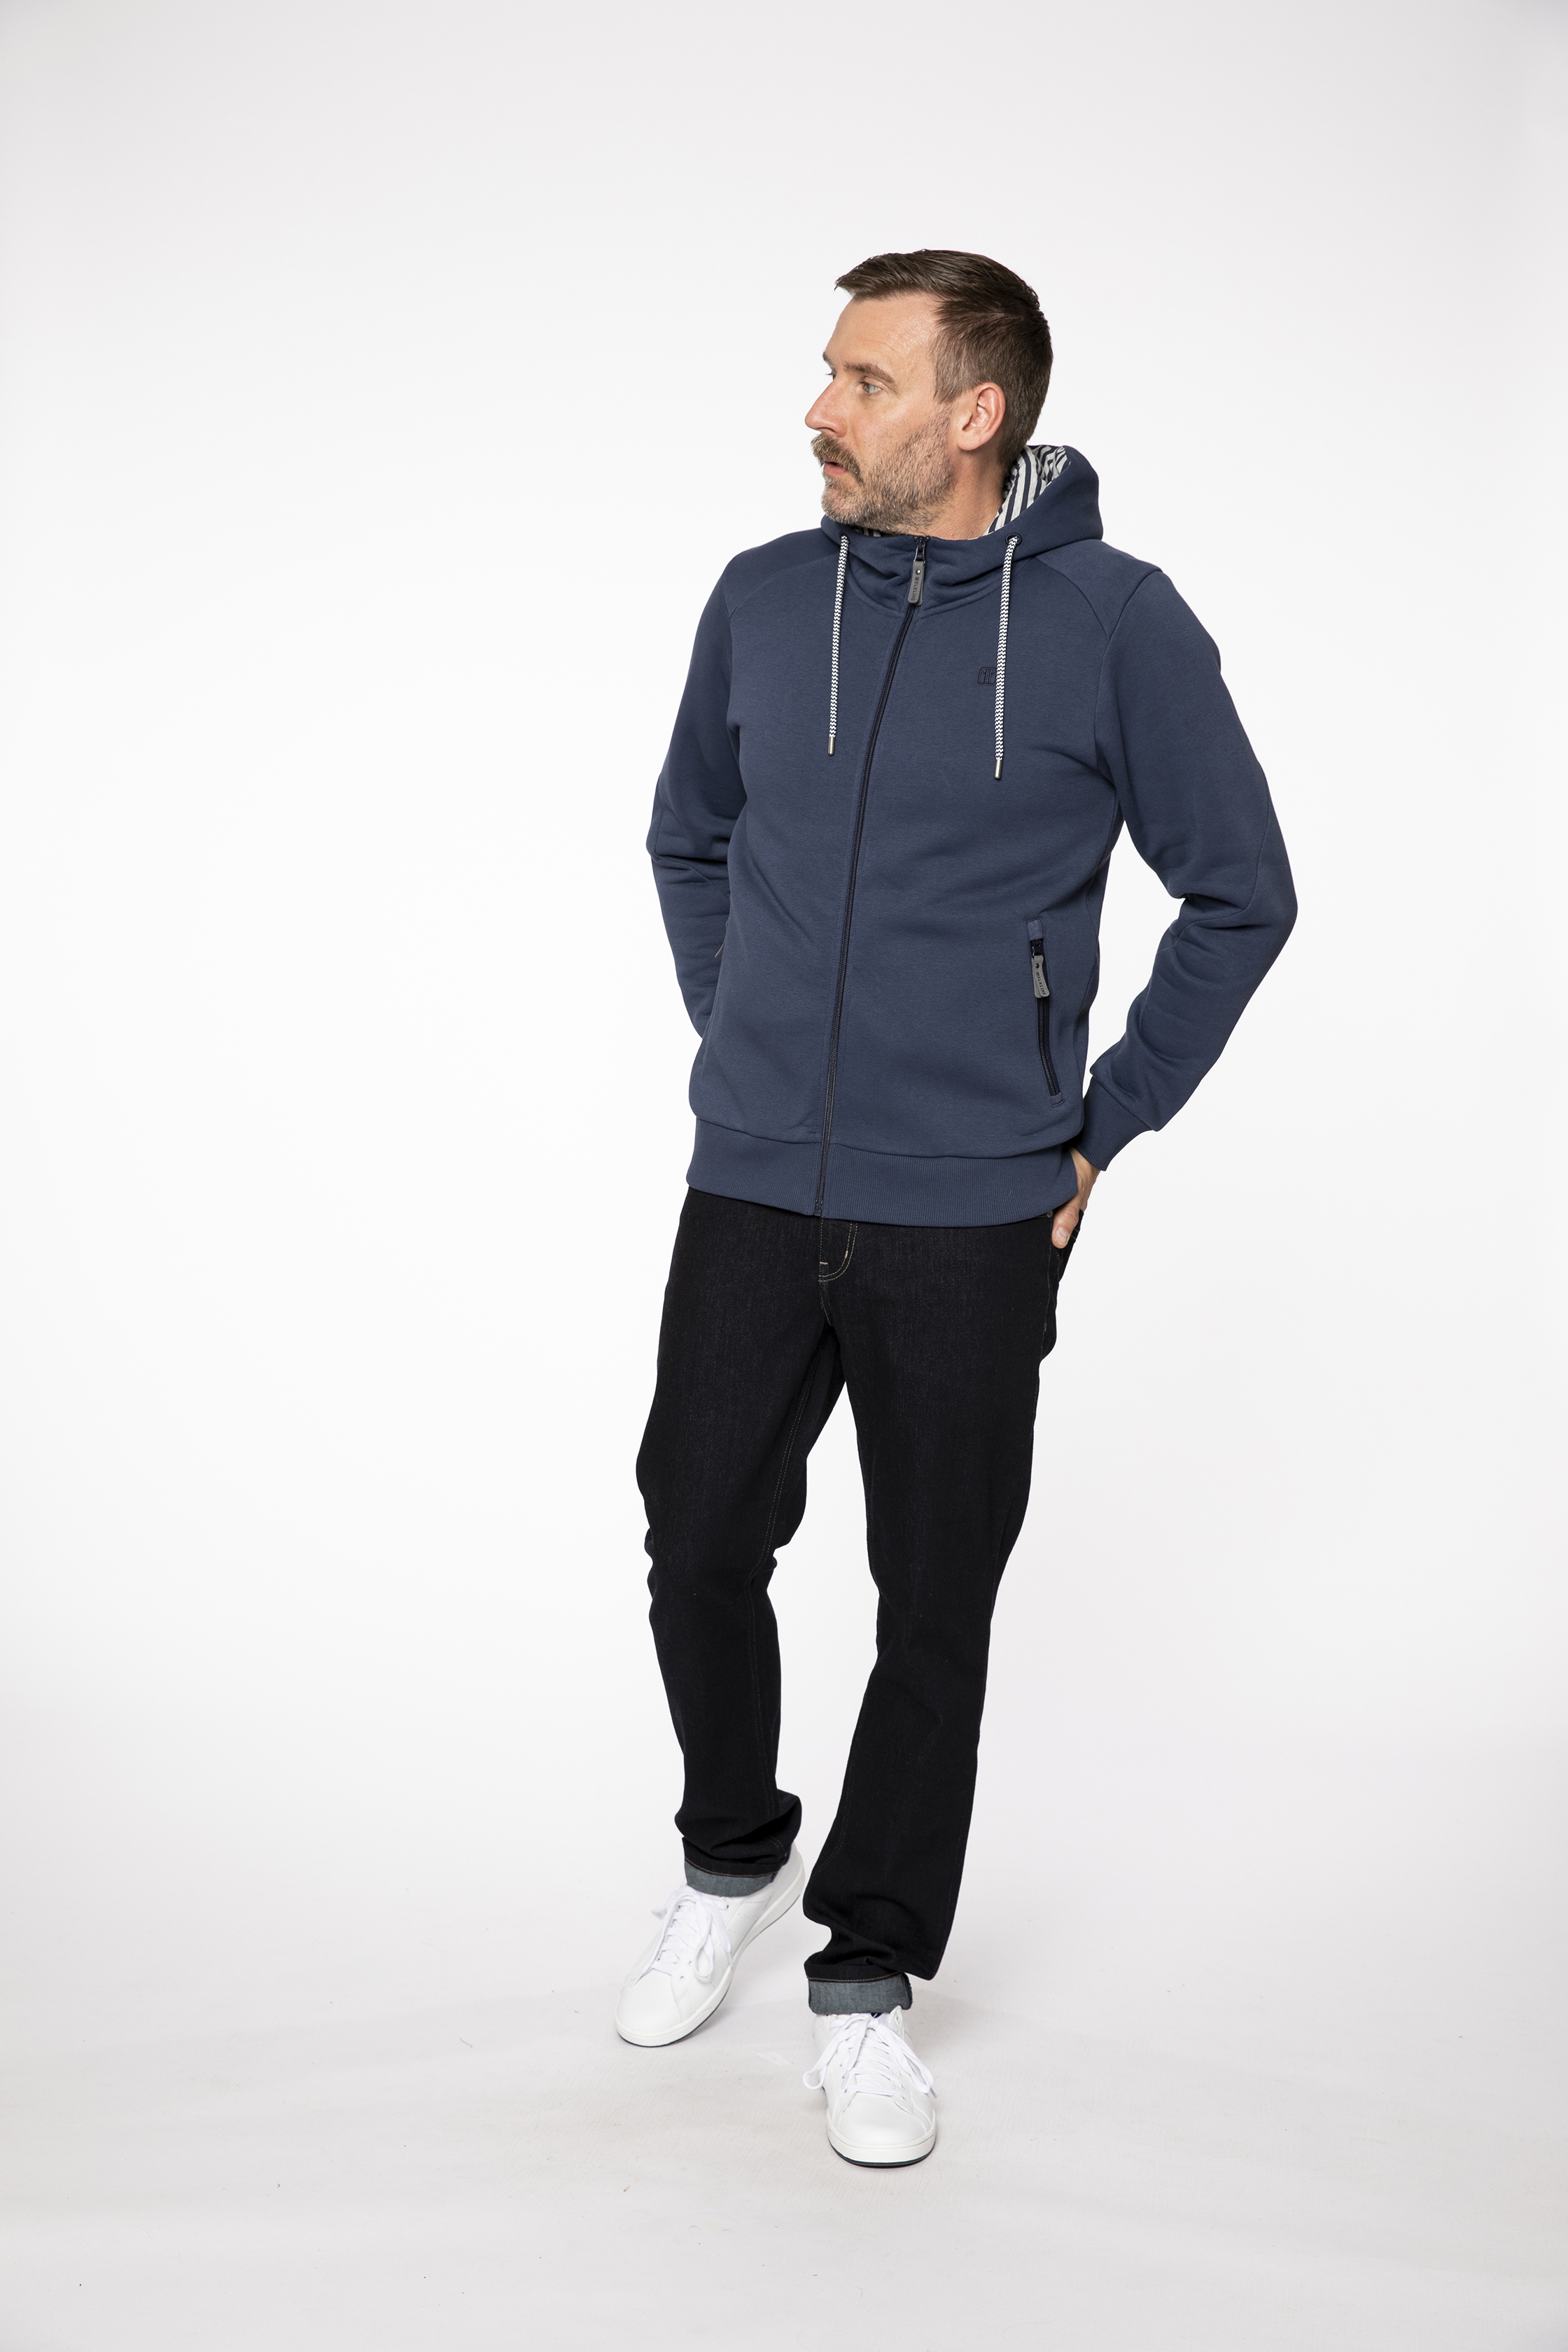 sweat jacket:  LIGHTAFIRE   denim pants:  COMPAGNON